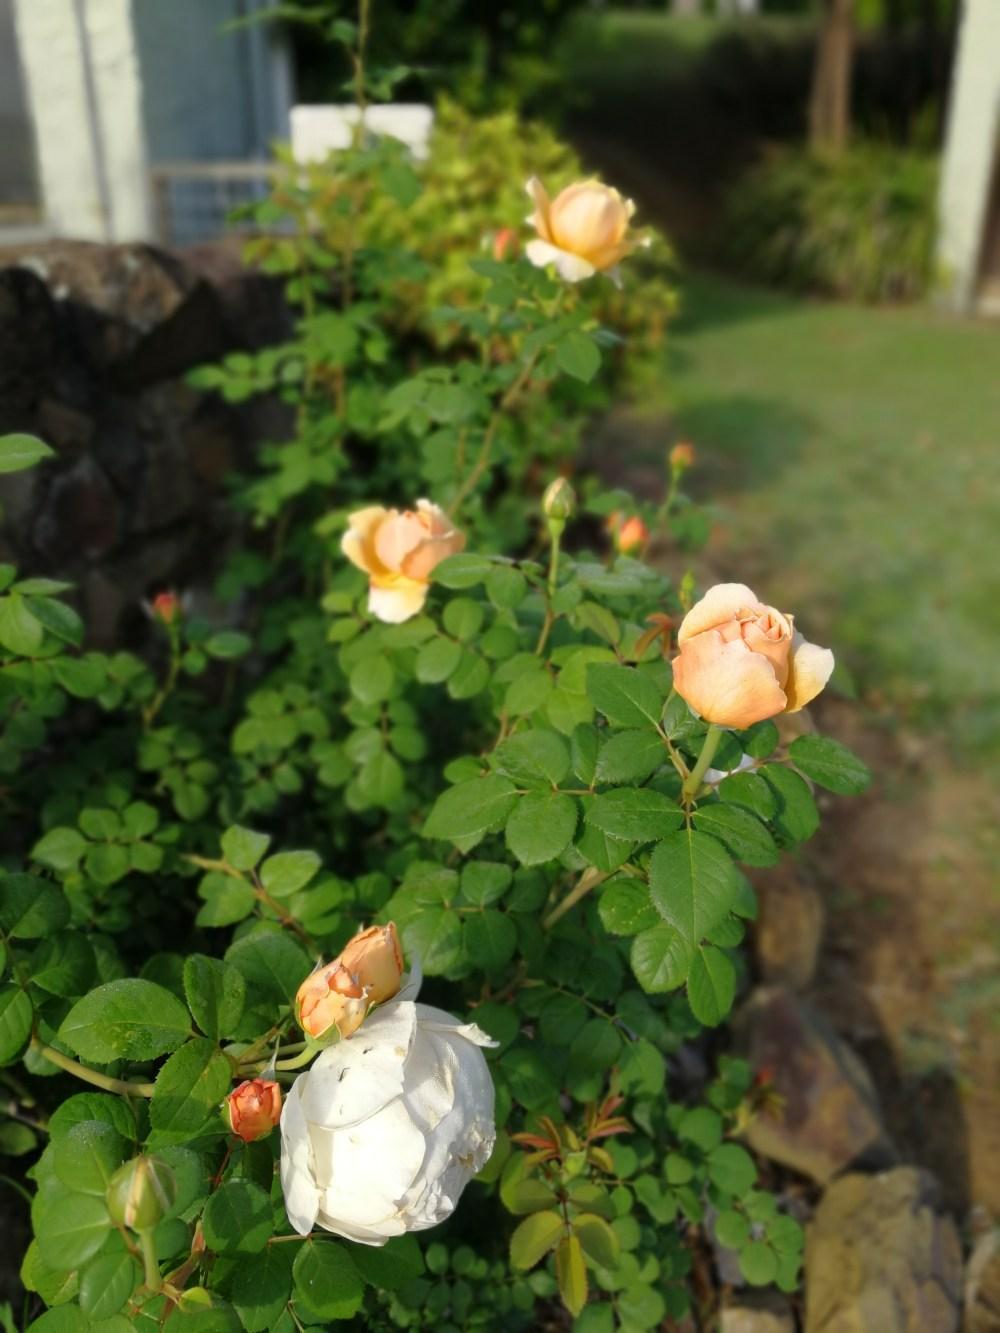 David Austin rose bush in Queensland Australia Charles Darwin apricot colour